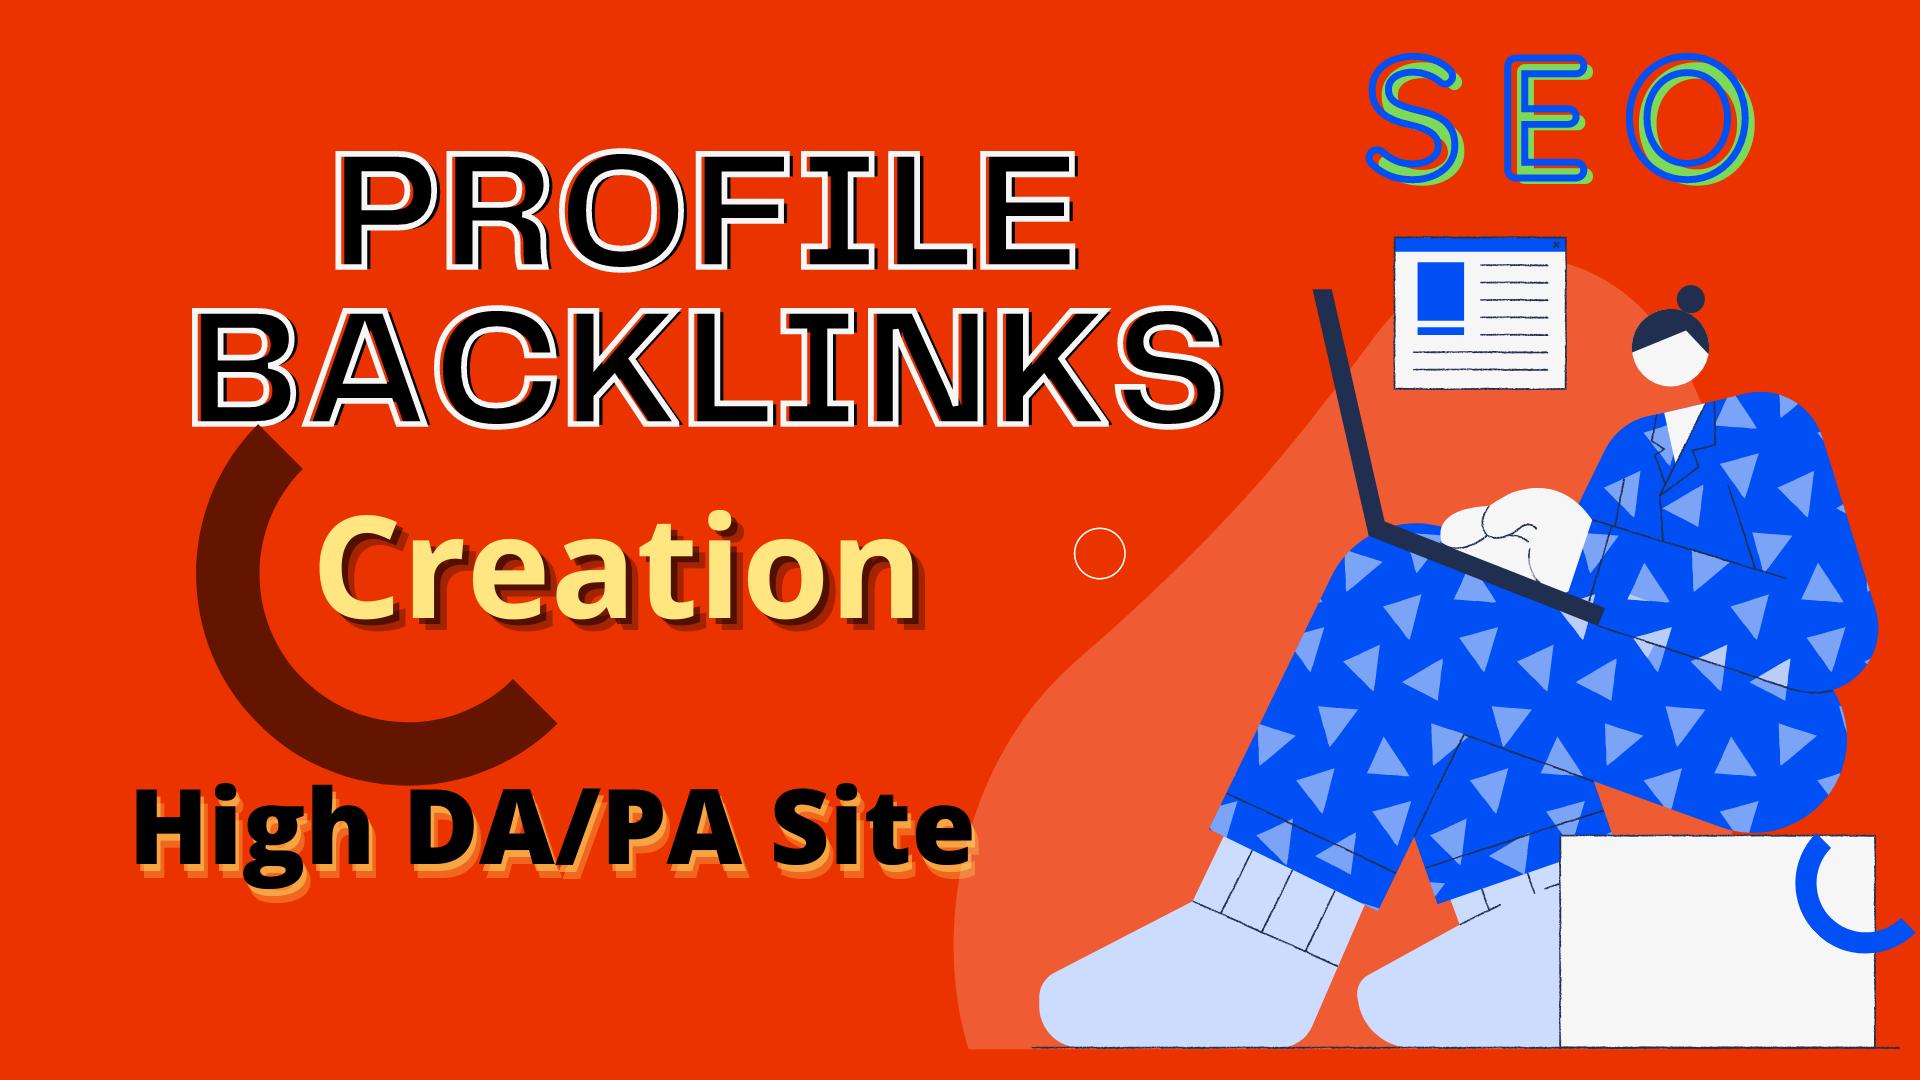 I will Creation 70 Profile Backlinks Latest & High DA/PA Sites